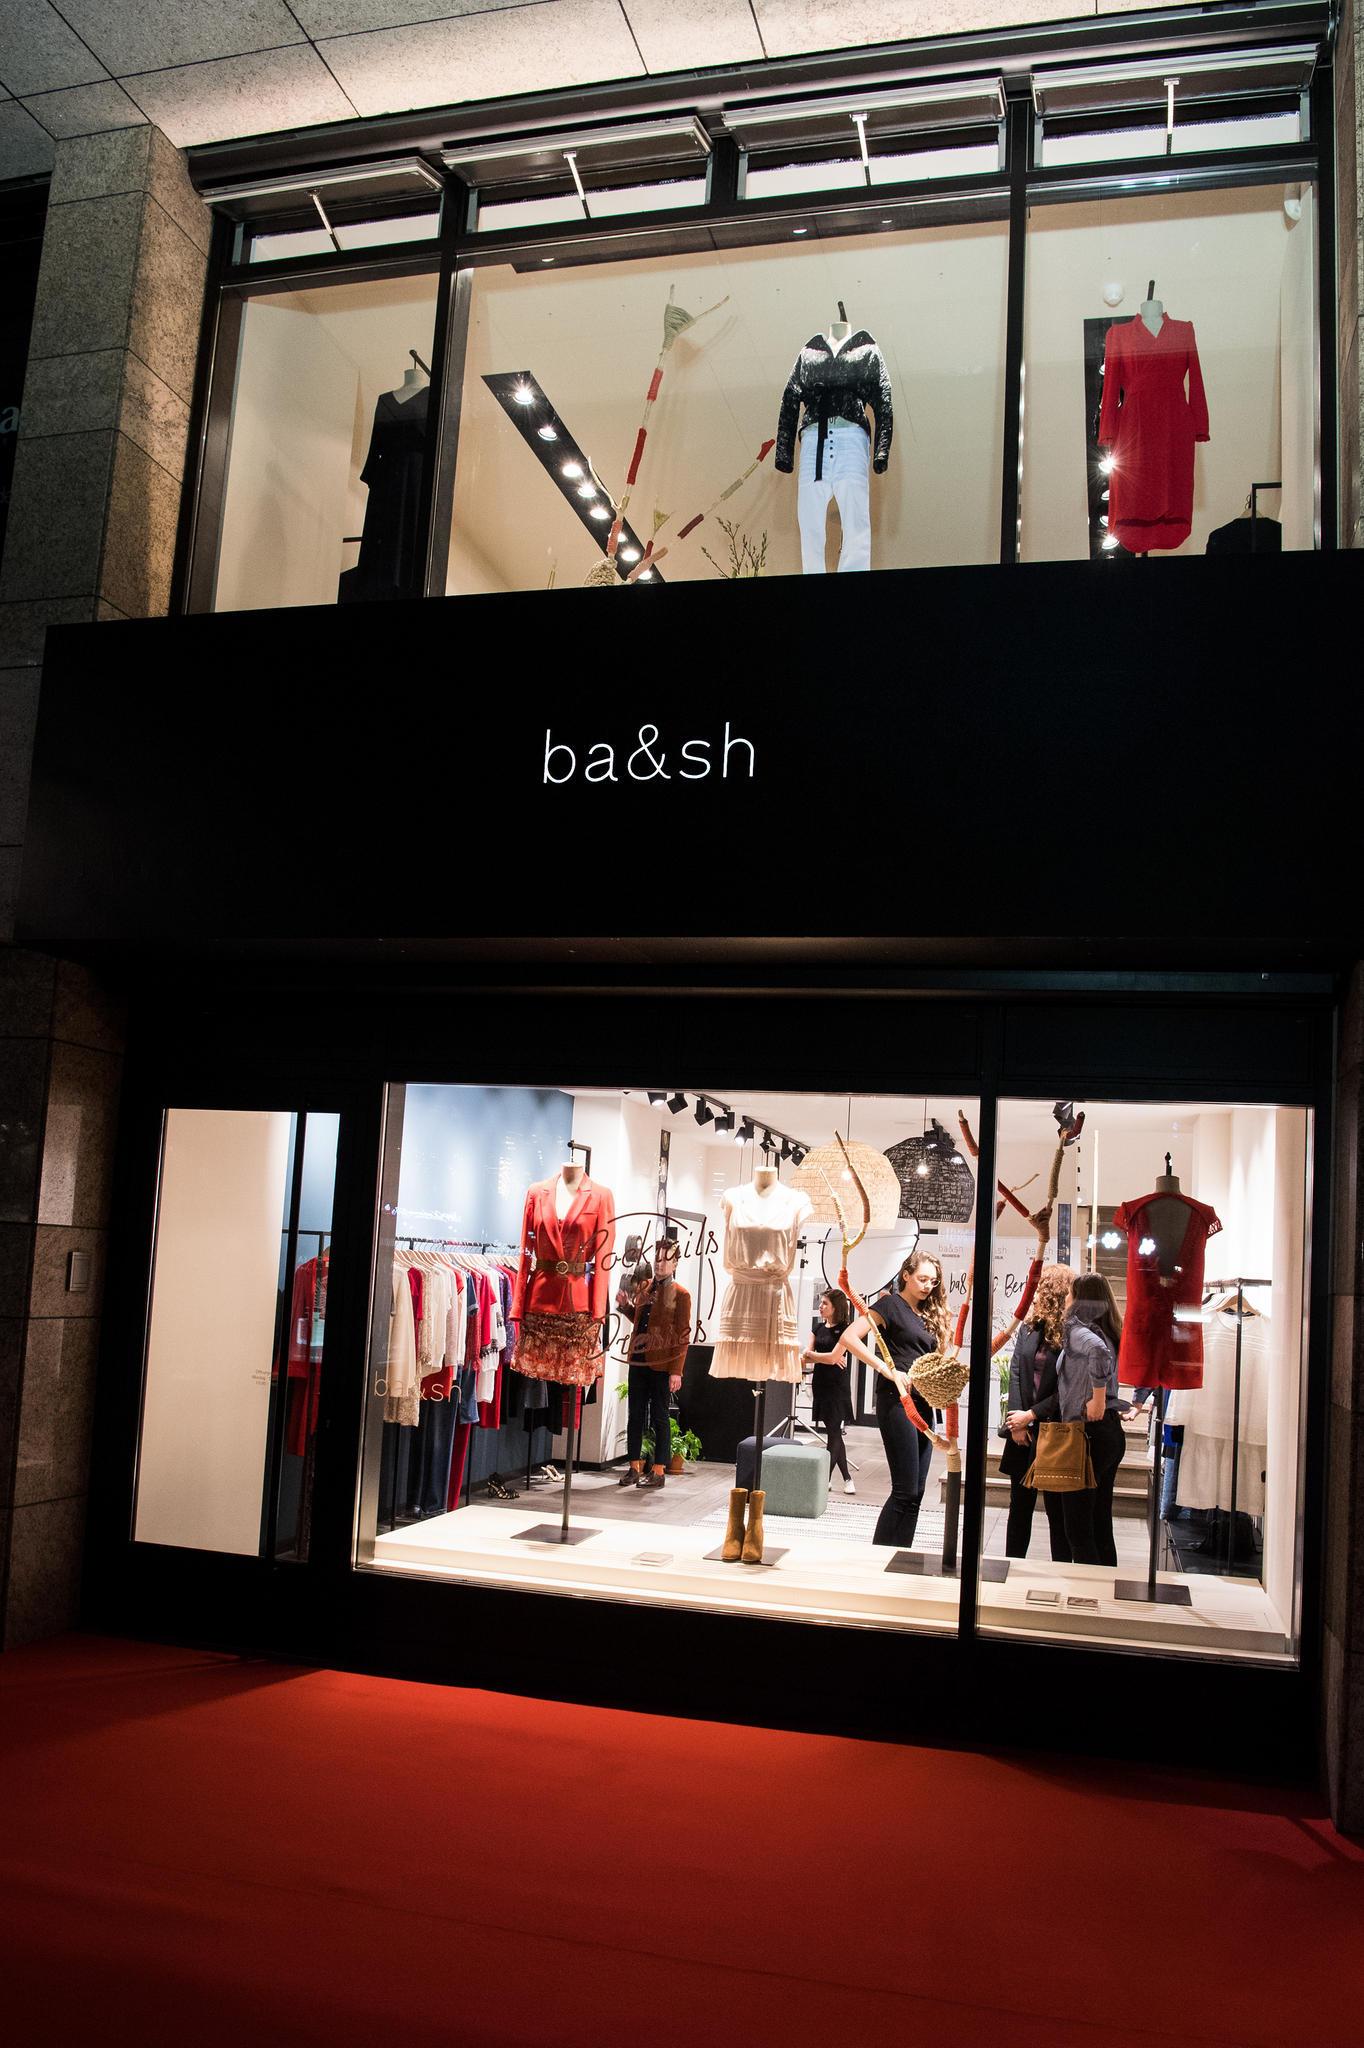 Eröffnung des ba&sh-Stores